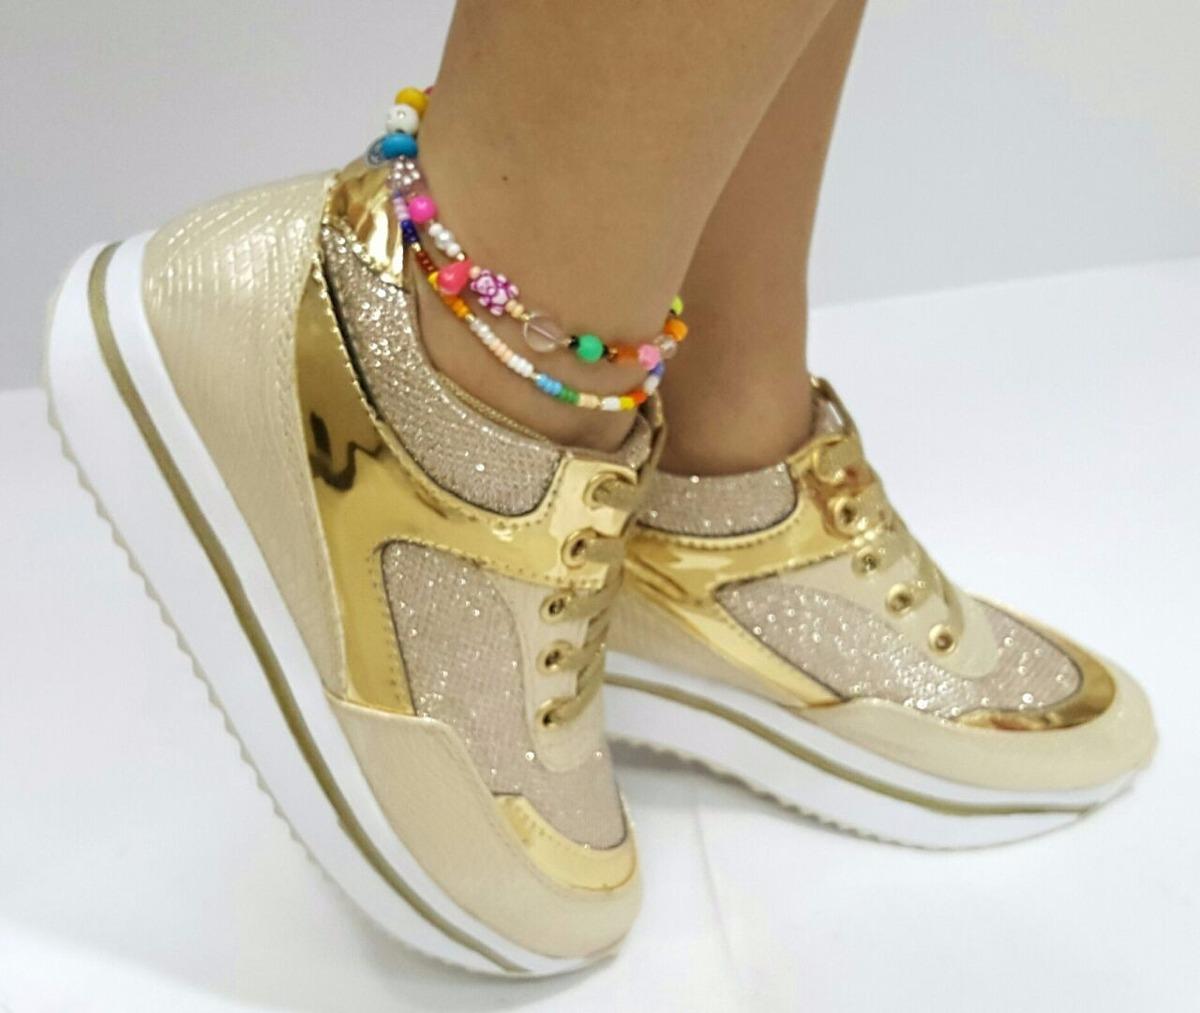 e06eb6fd zapatos calzados dorado tenis dama mujer fabrica en colombia. Cargando zoom.